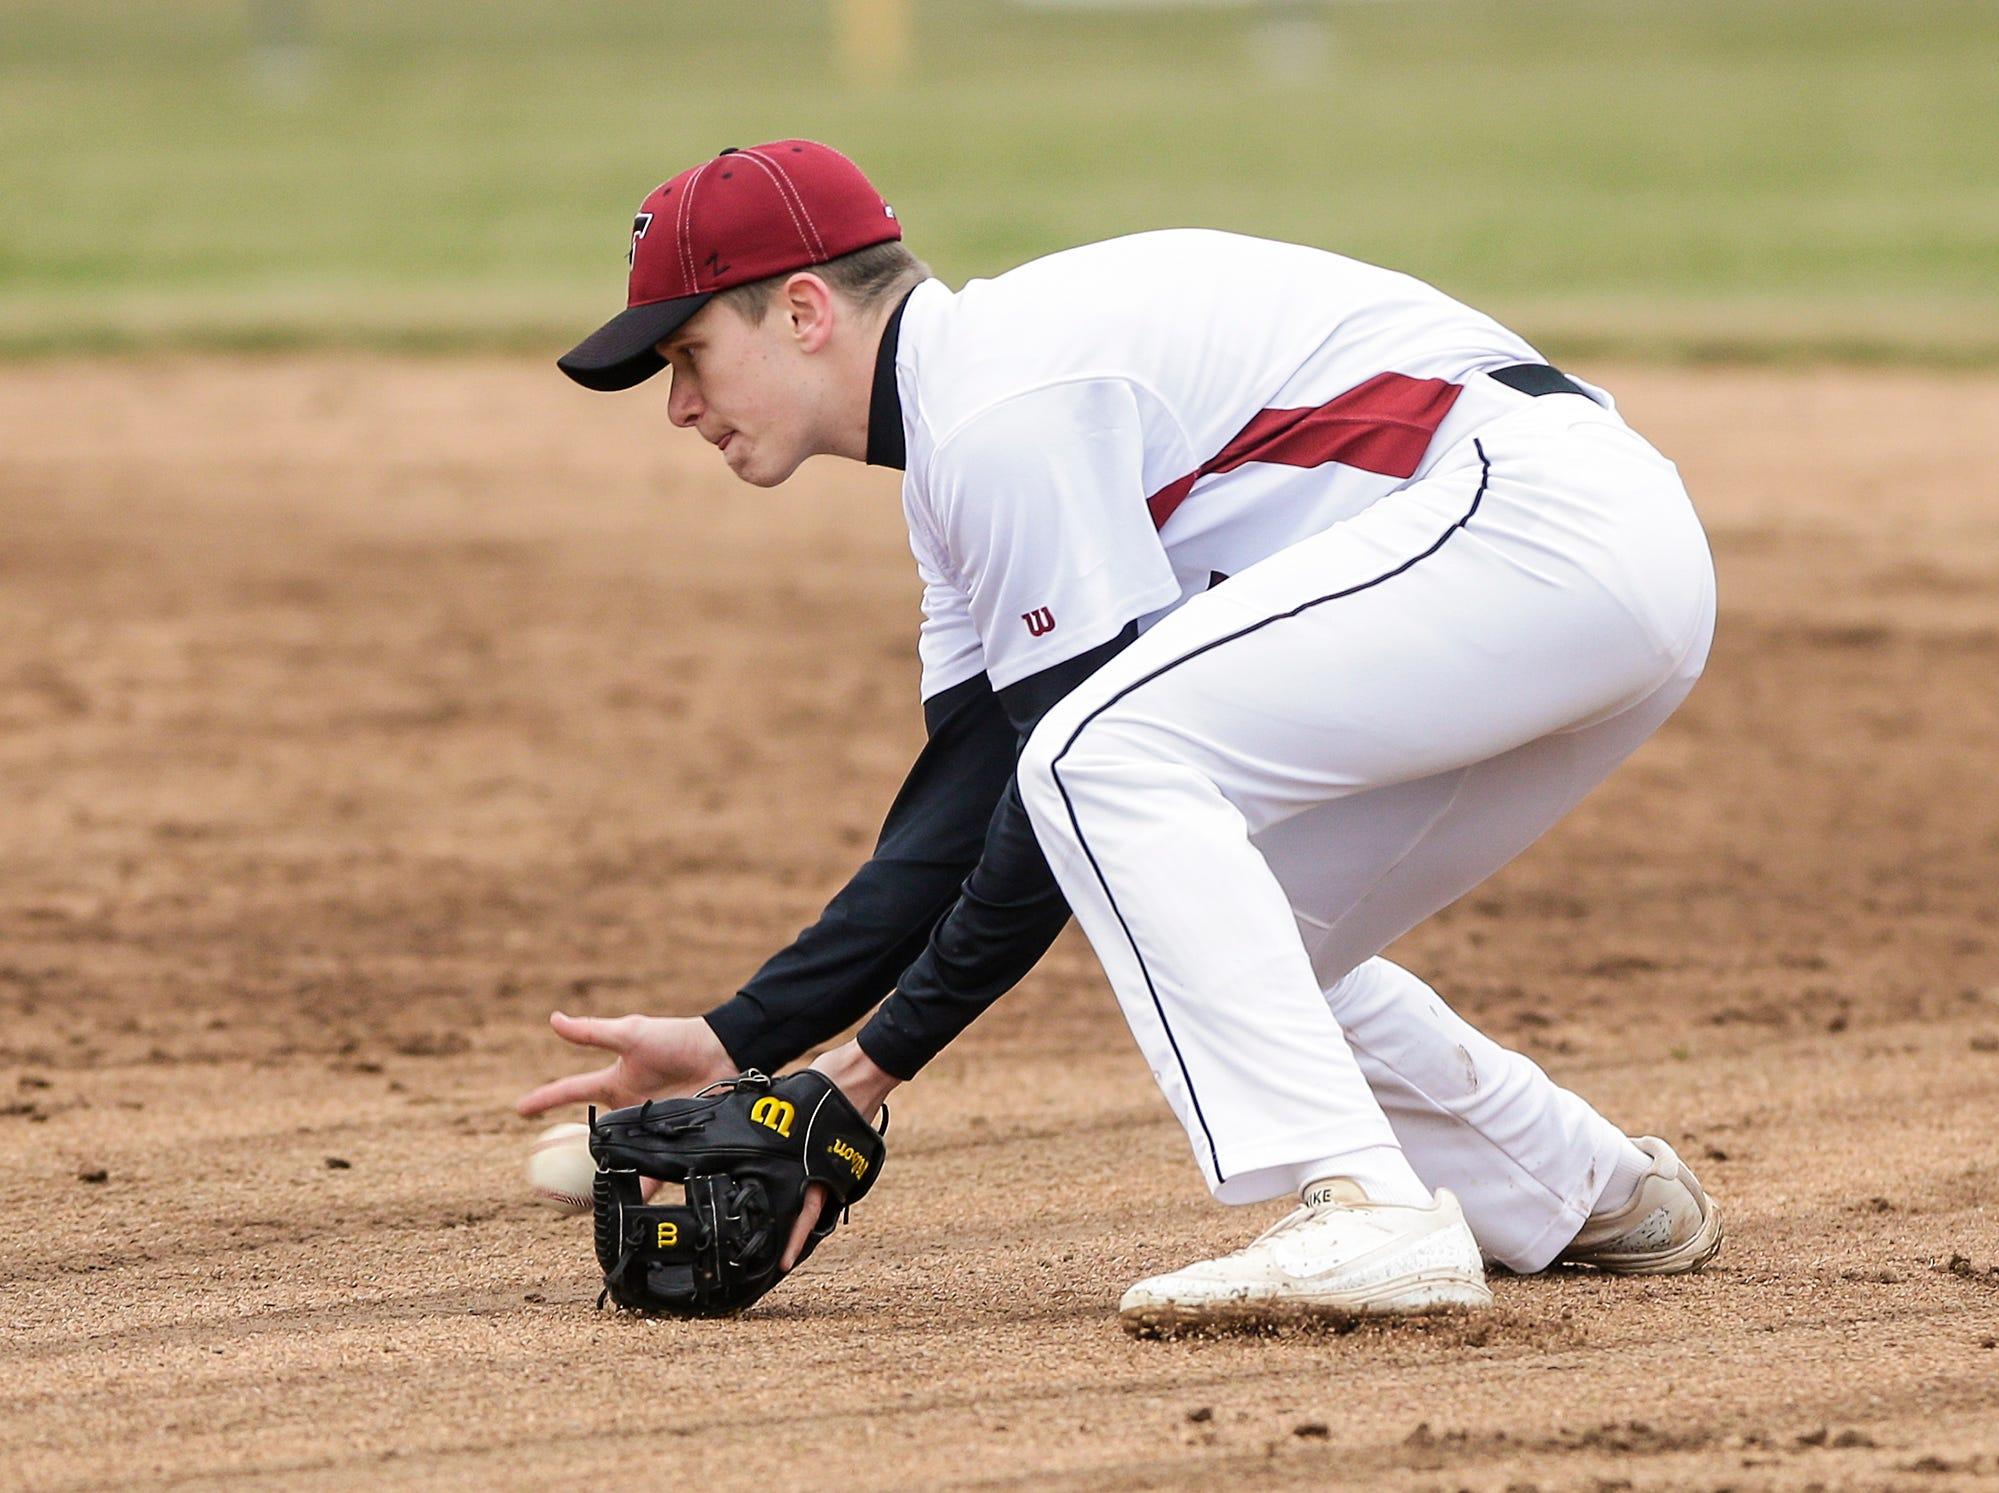 Fond du Lac High School baseball's Sam Hernandez fields a ground ball against Neenah High School during their game Thursday, April 18, 2019 in Fond du Lac, Wis. Doug Raflik/USA TODAY NETWORK-Wisconsin